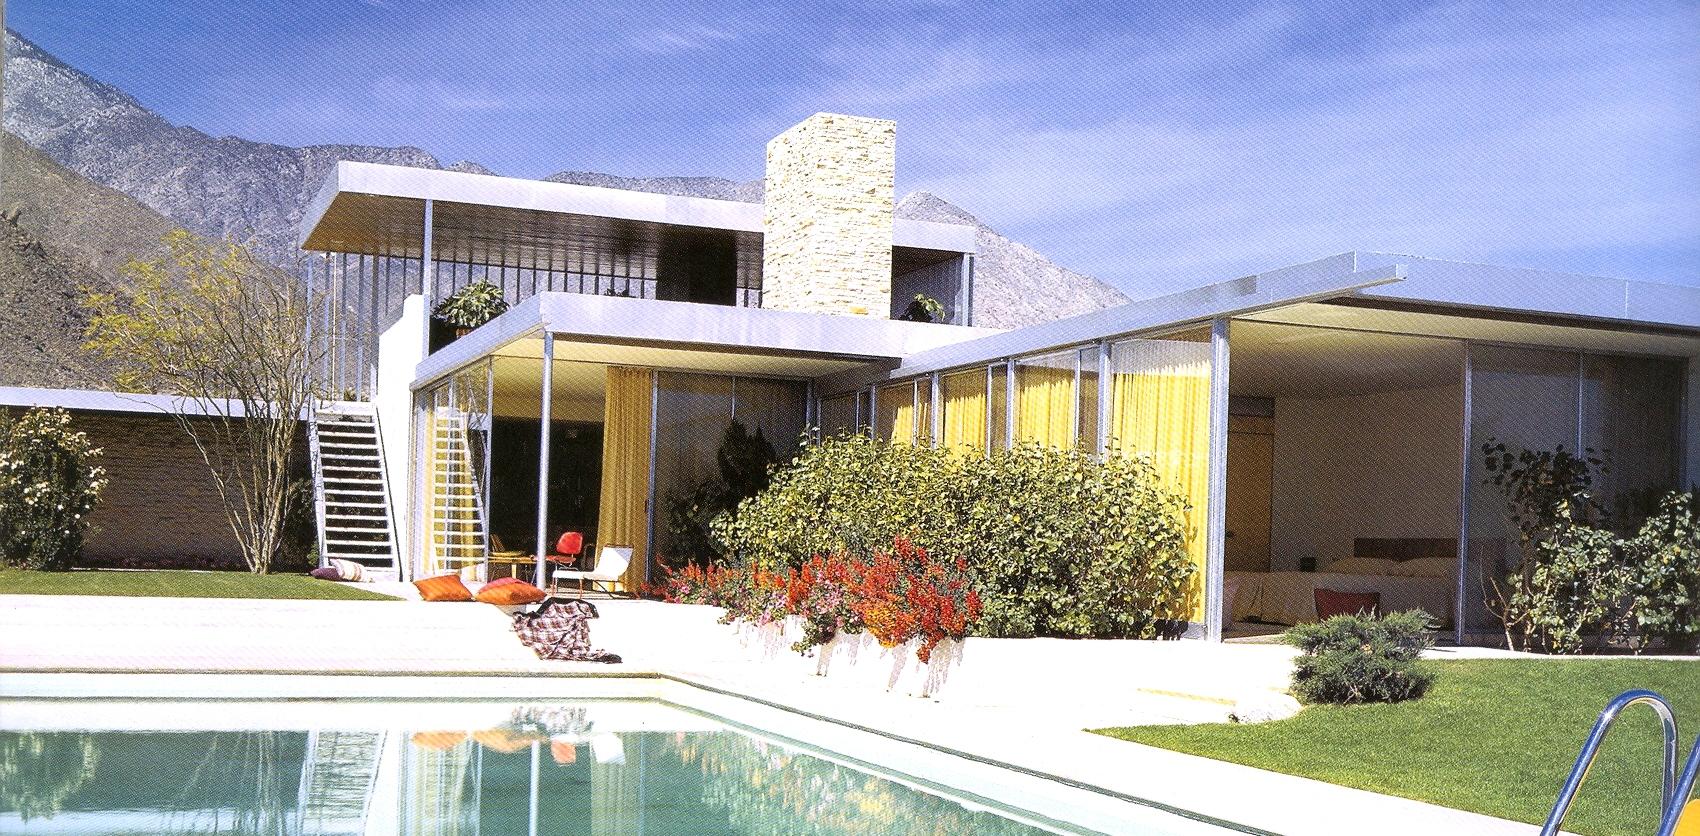 La arquitectura de Richard Neutra 18921970 El sueo americano  Pedro da Cruz